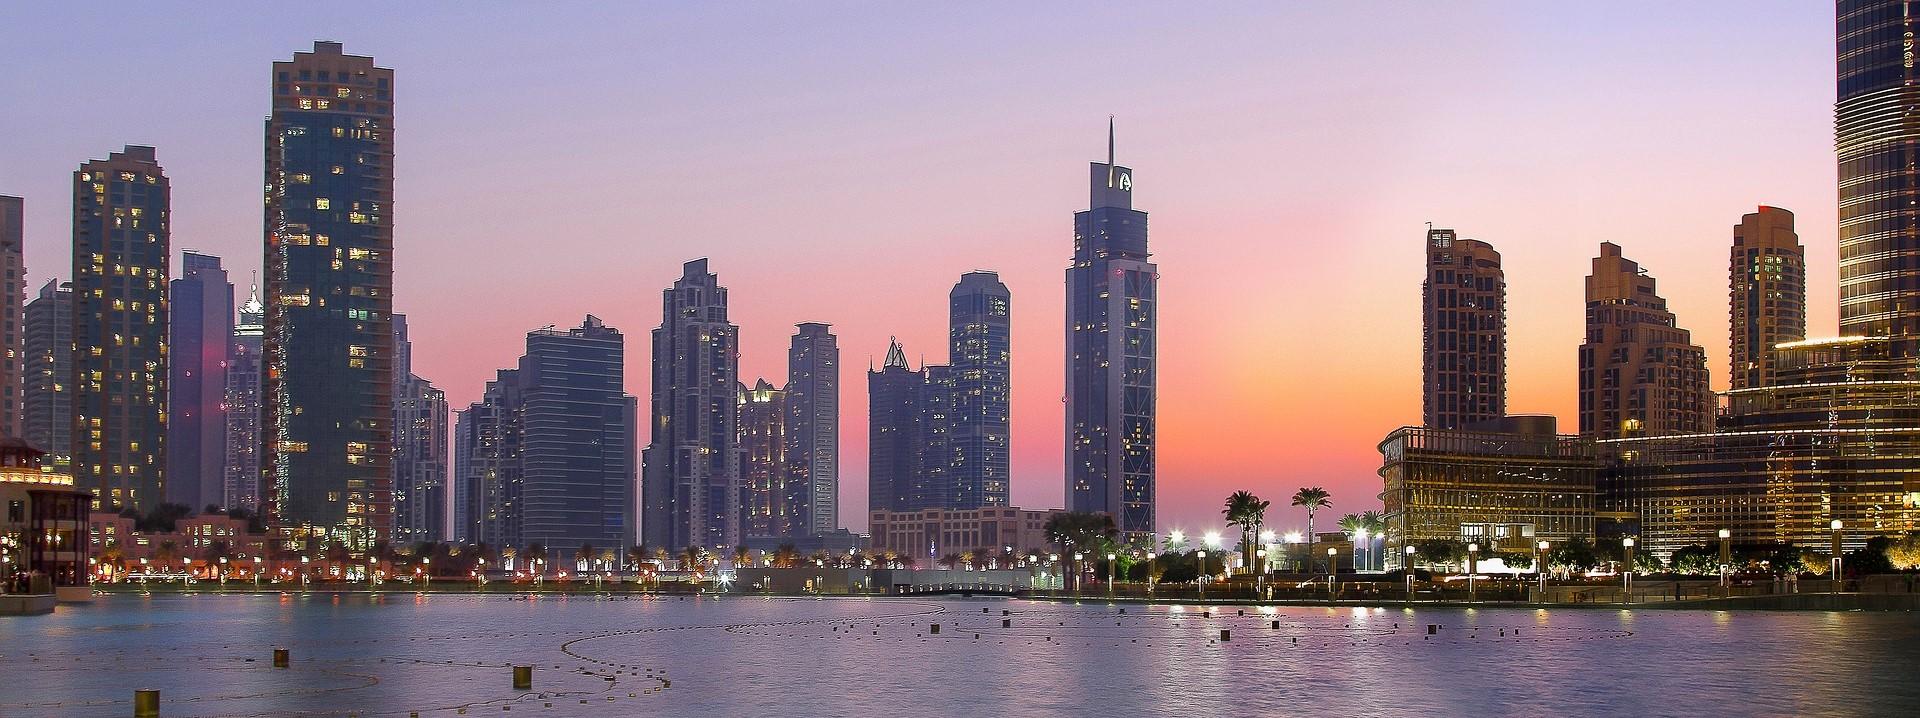 Best of Dubai and U.A.E.